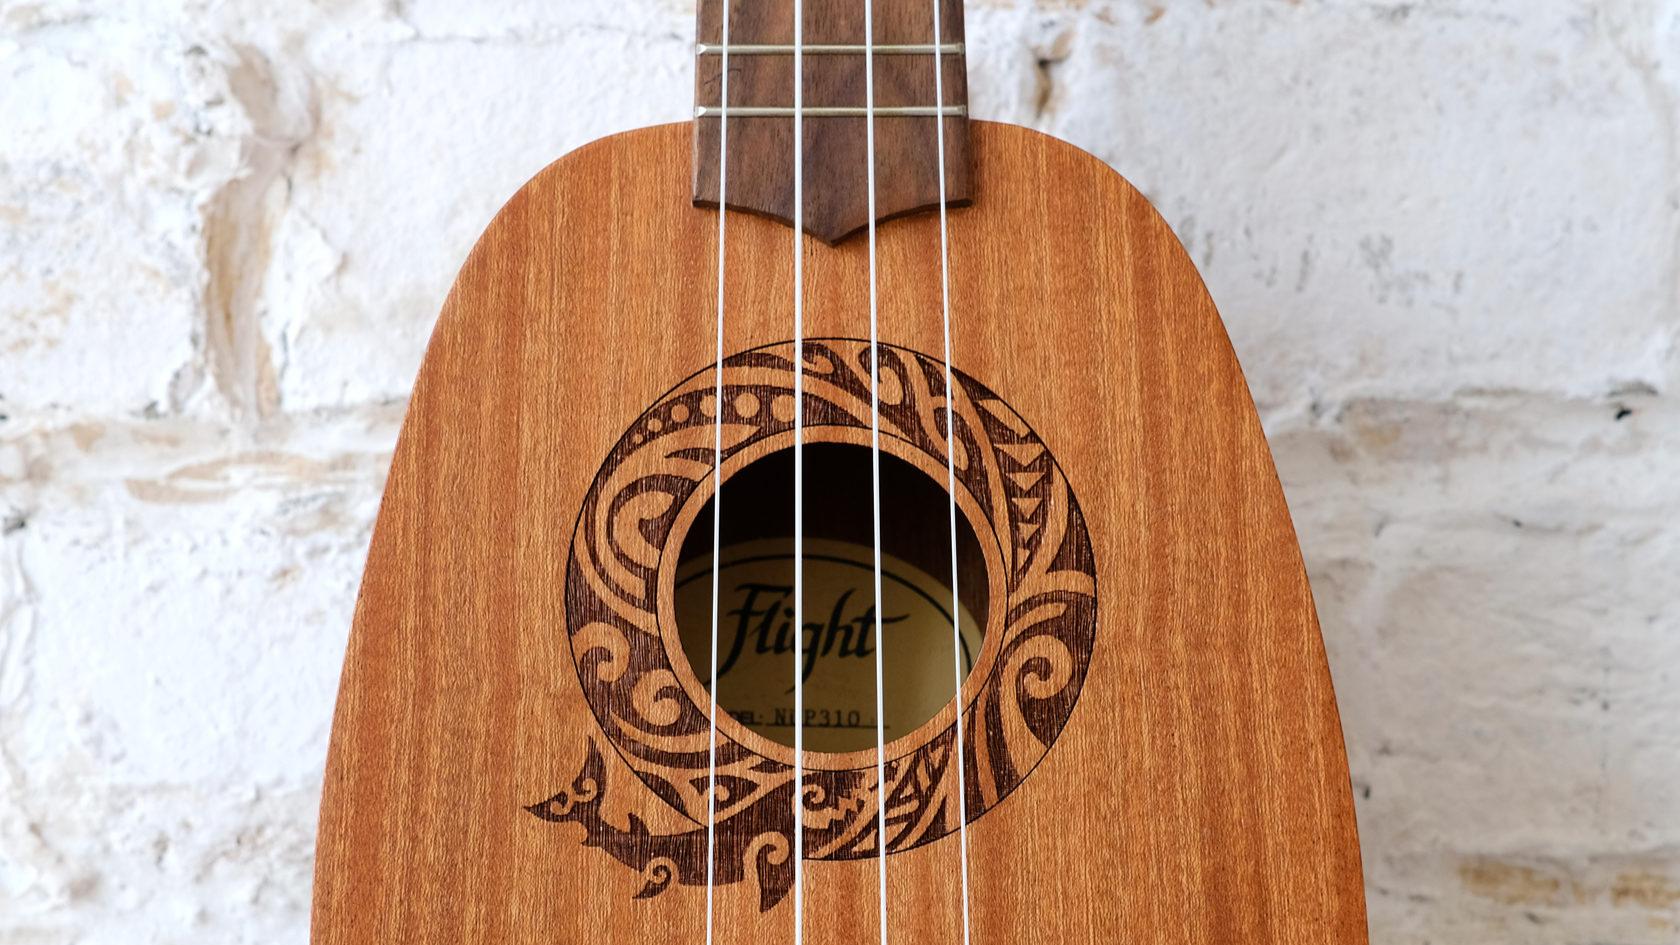 Купить укулеле сопрано Flight NUP 310 в магазине ukelovers, ukulele Flight